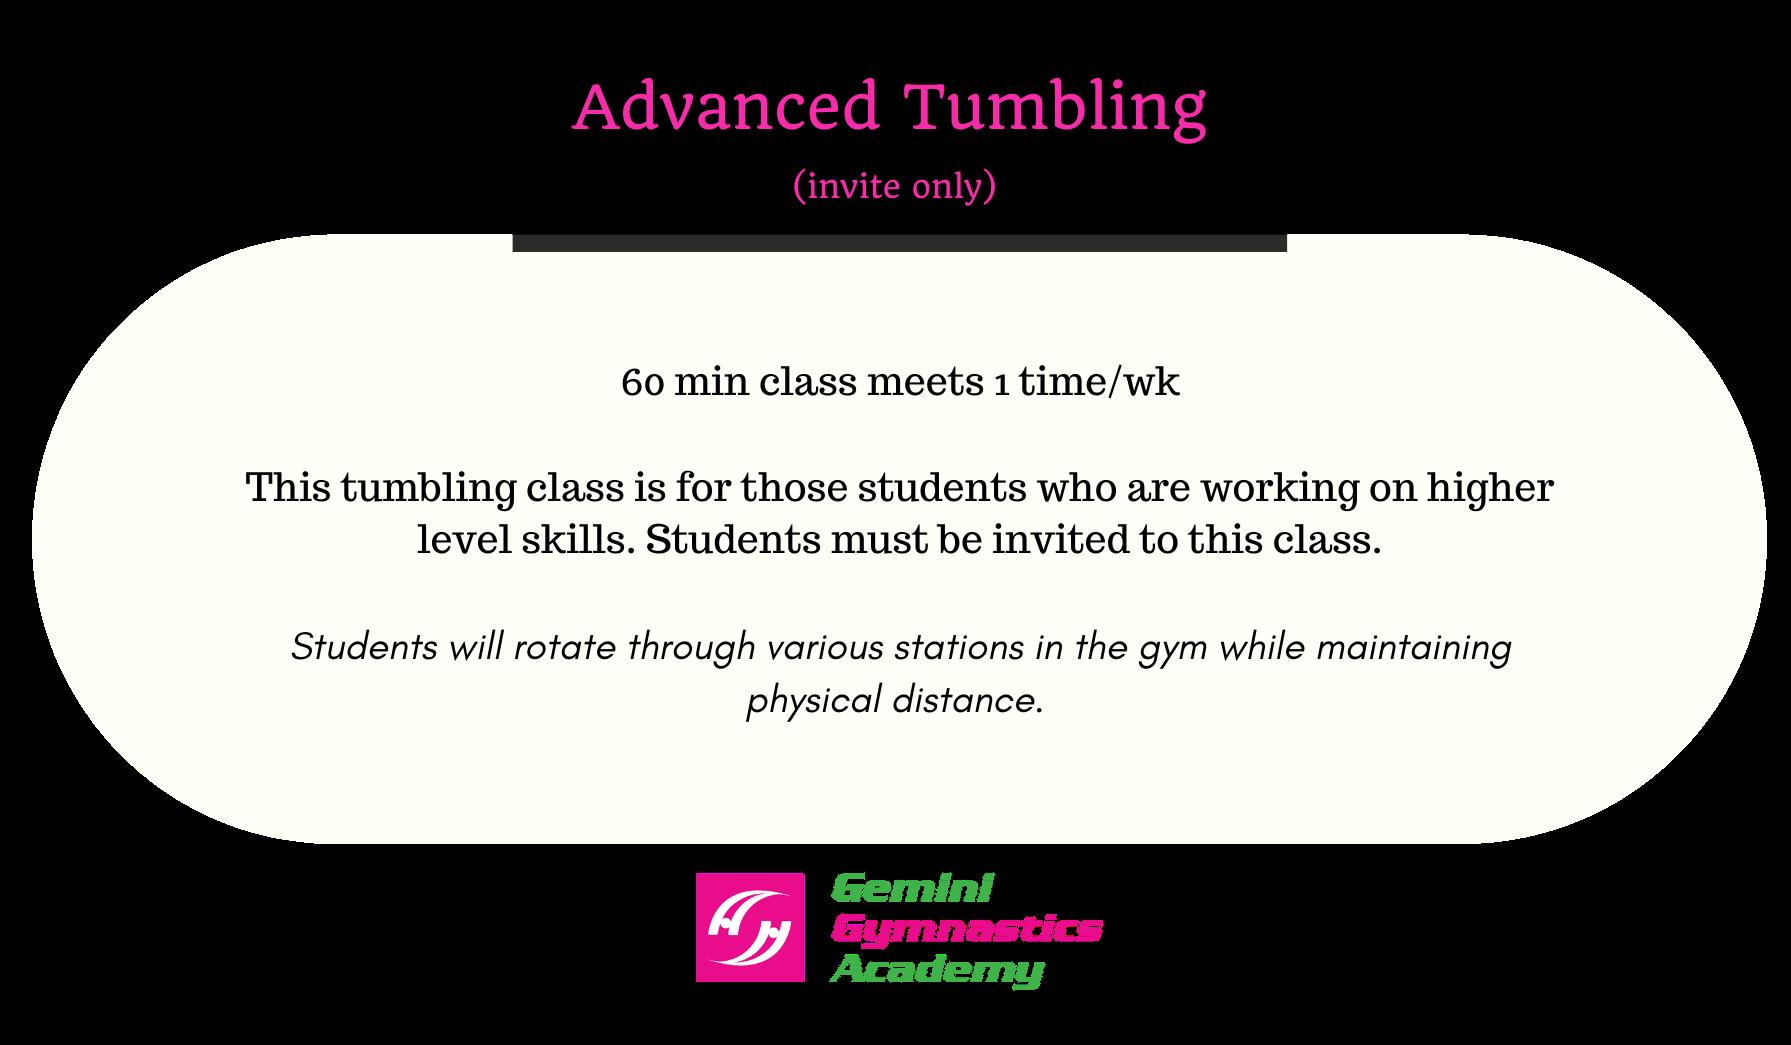 Adv tumbling